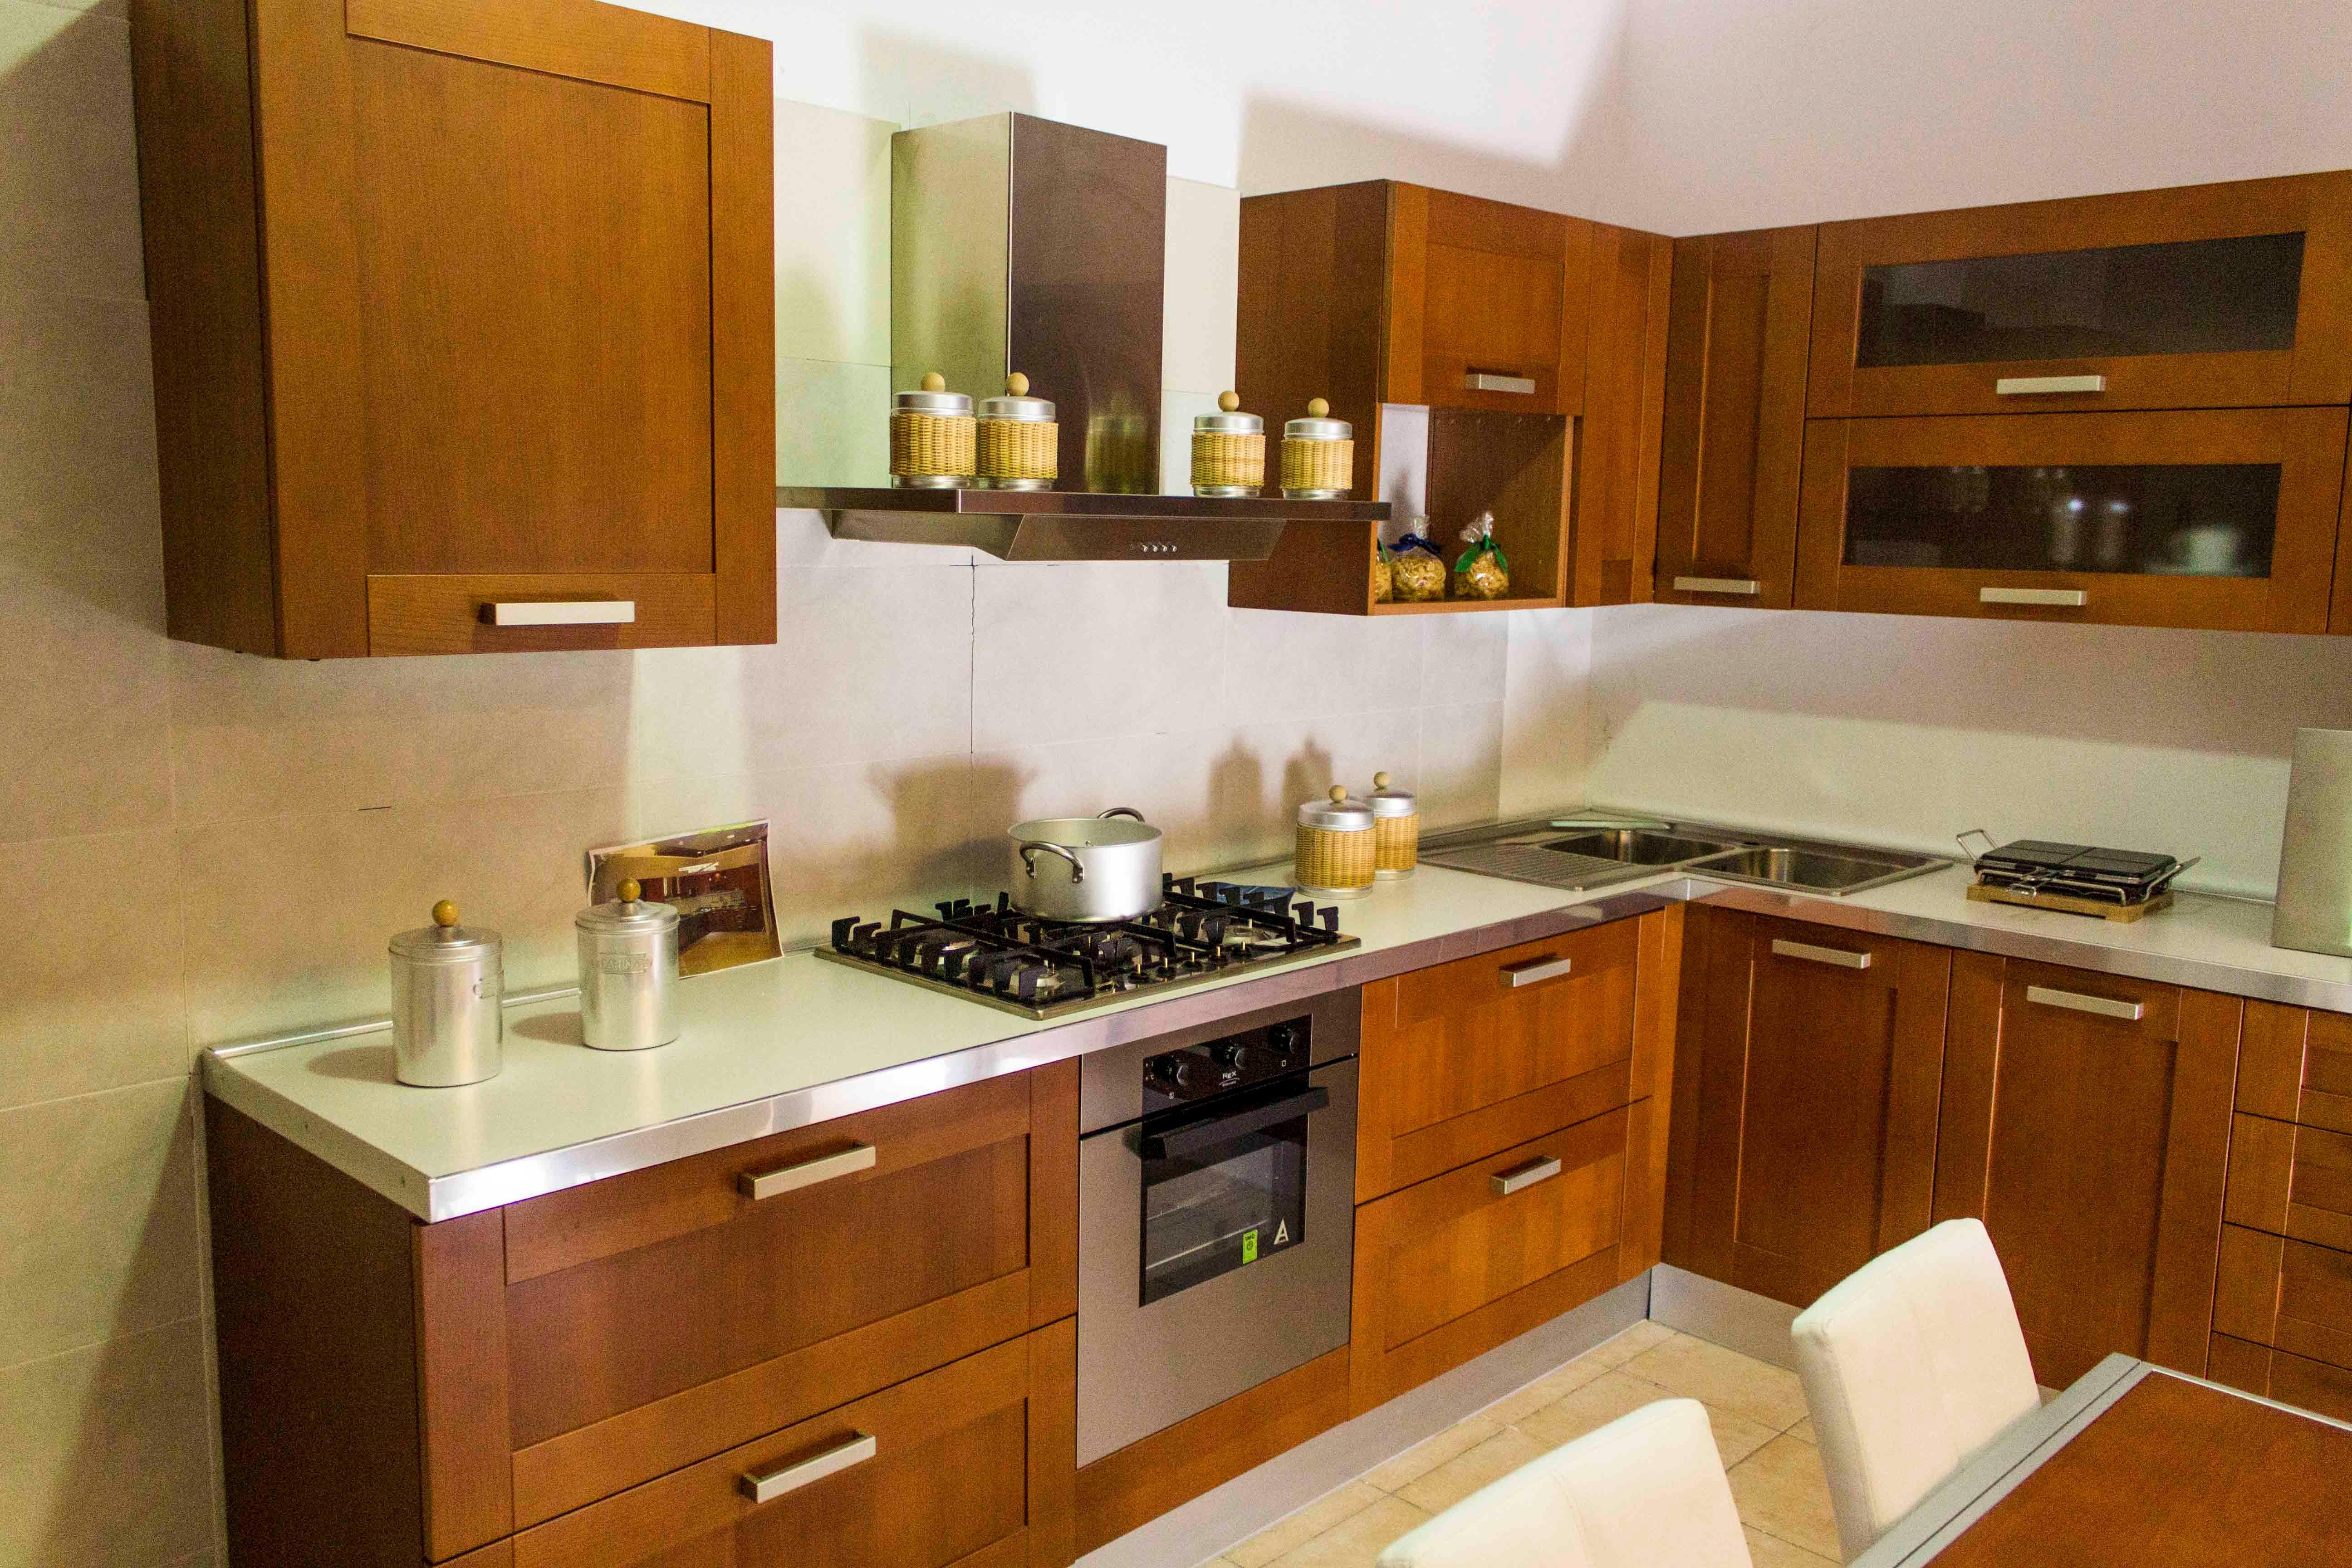 Veneta Cucine Cucina California Colore Ciliegio Scontato Del  68 %  #AF5302 5184 3456 Veneta Cucine E Forma 2000